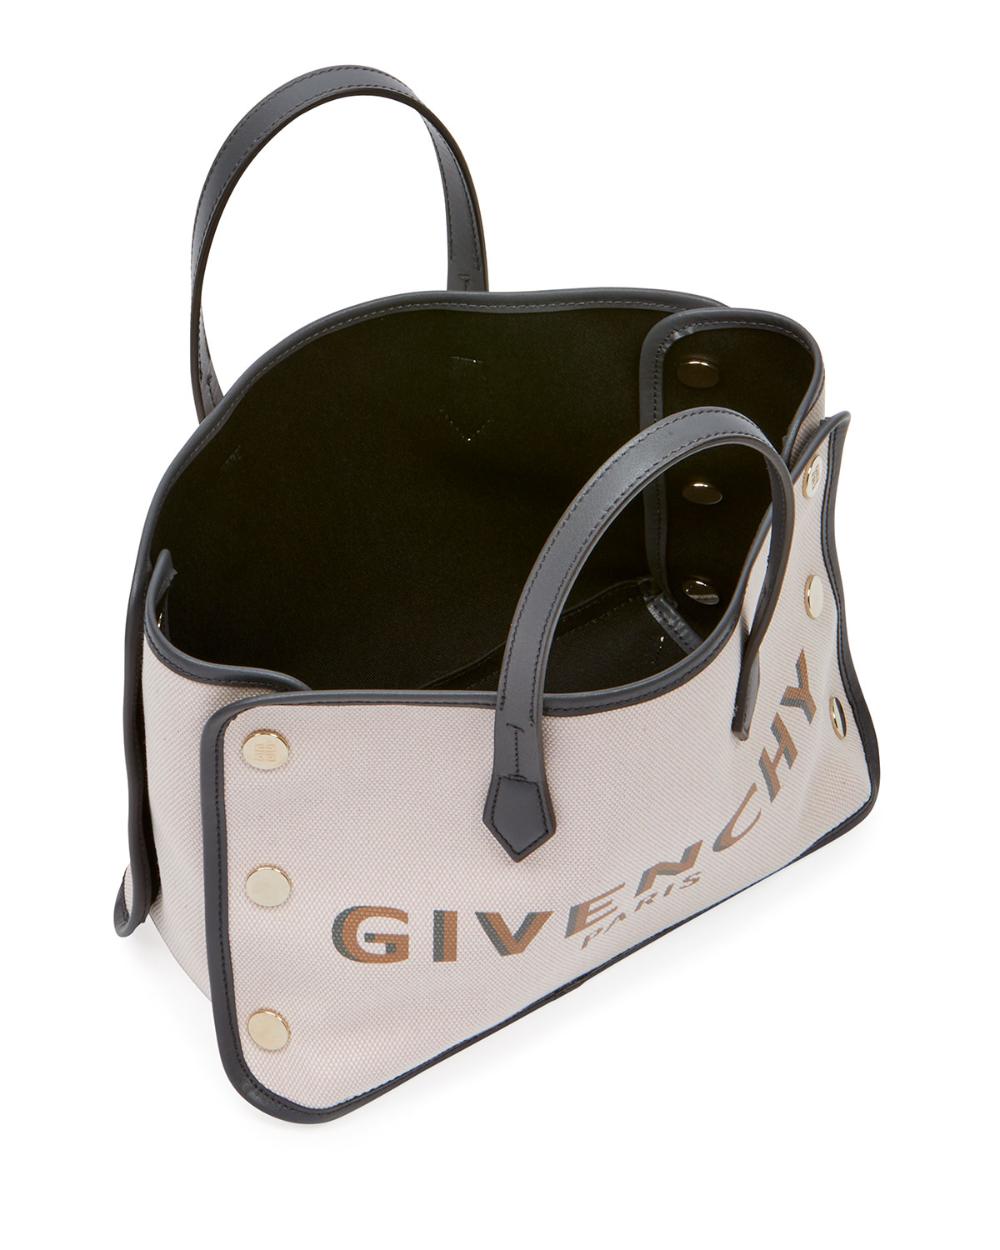 Givenchy Bond Mini Canvas Logo Tote Bag Mini Tote Bag Mini Tote Tote Bag